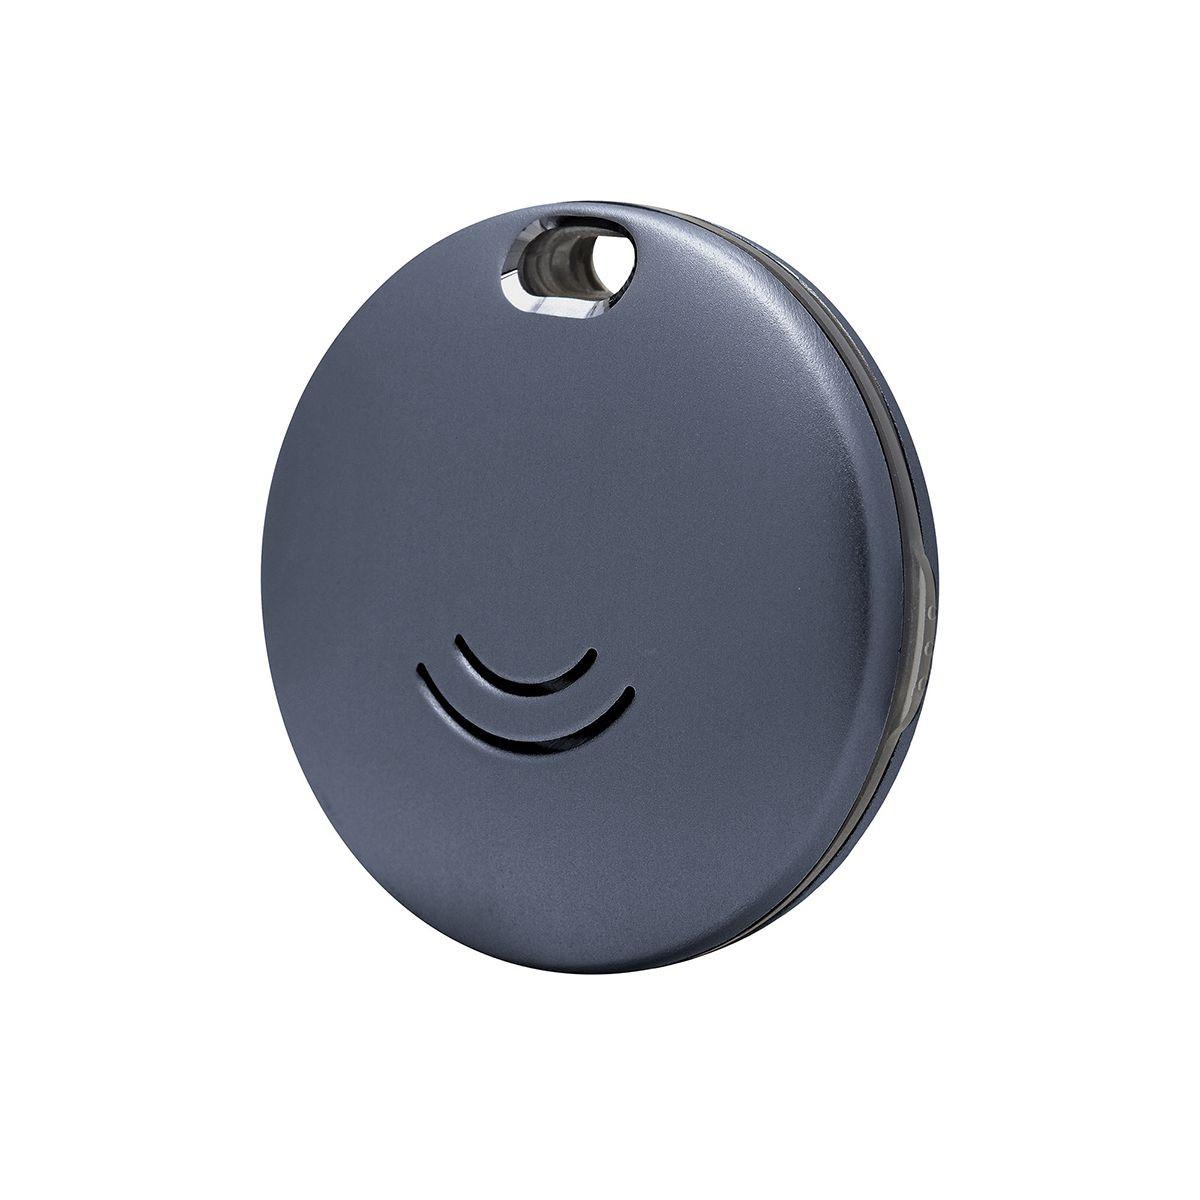 Orbit-Schlüssel | Dunkelgrau